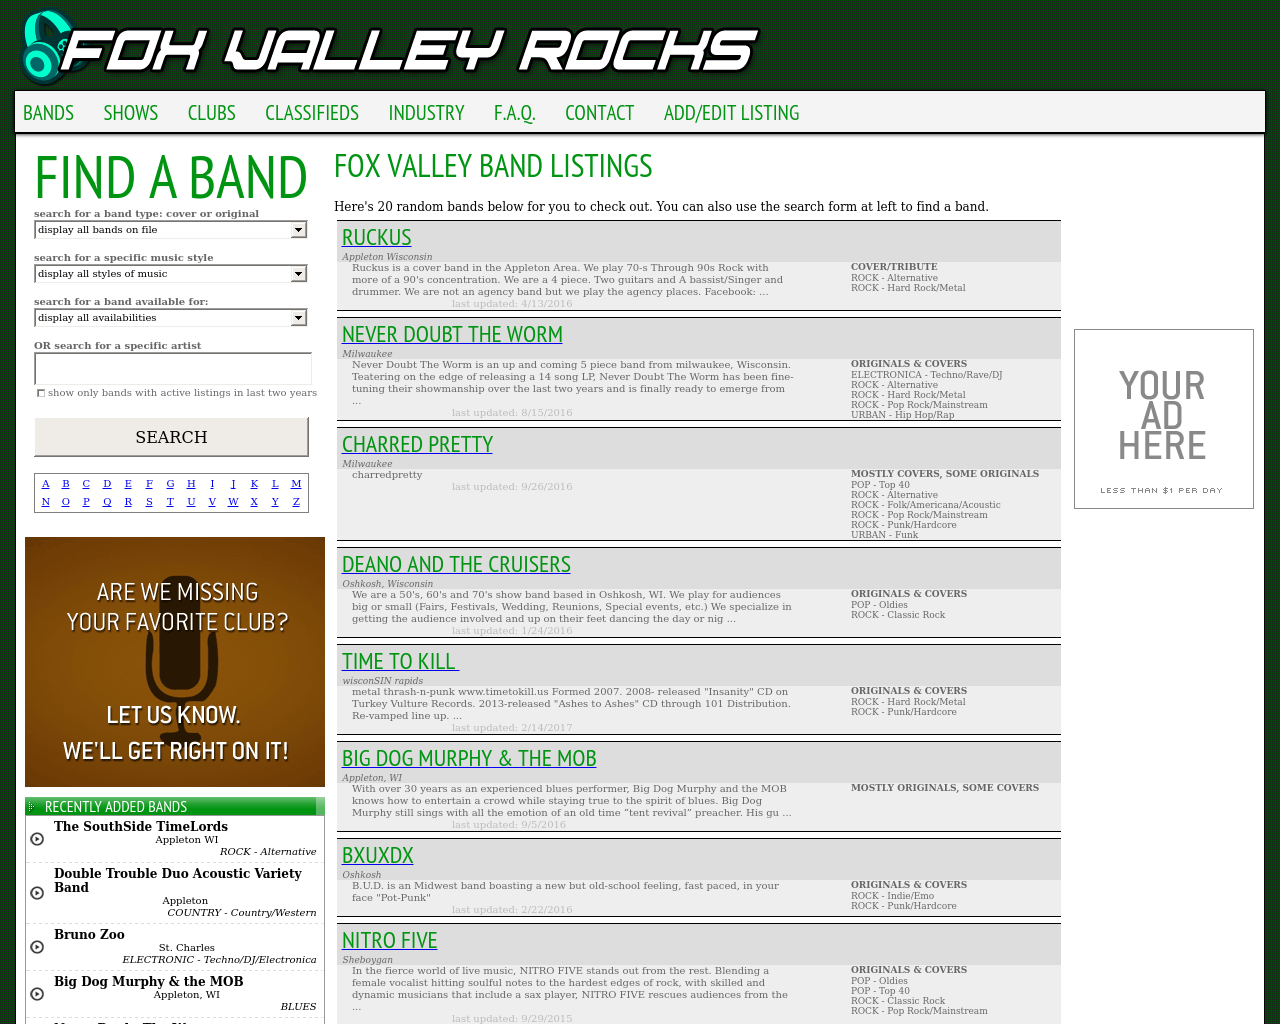 Fox-Valley-Rocks-Advertising-Reviews-Pricing